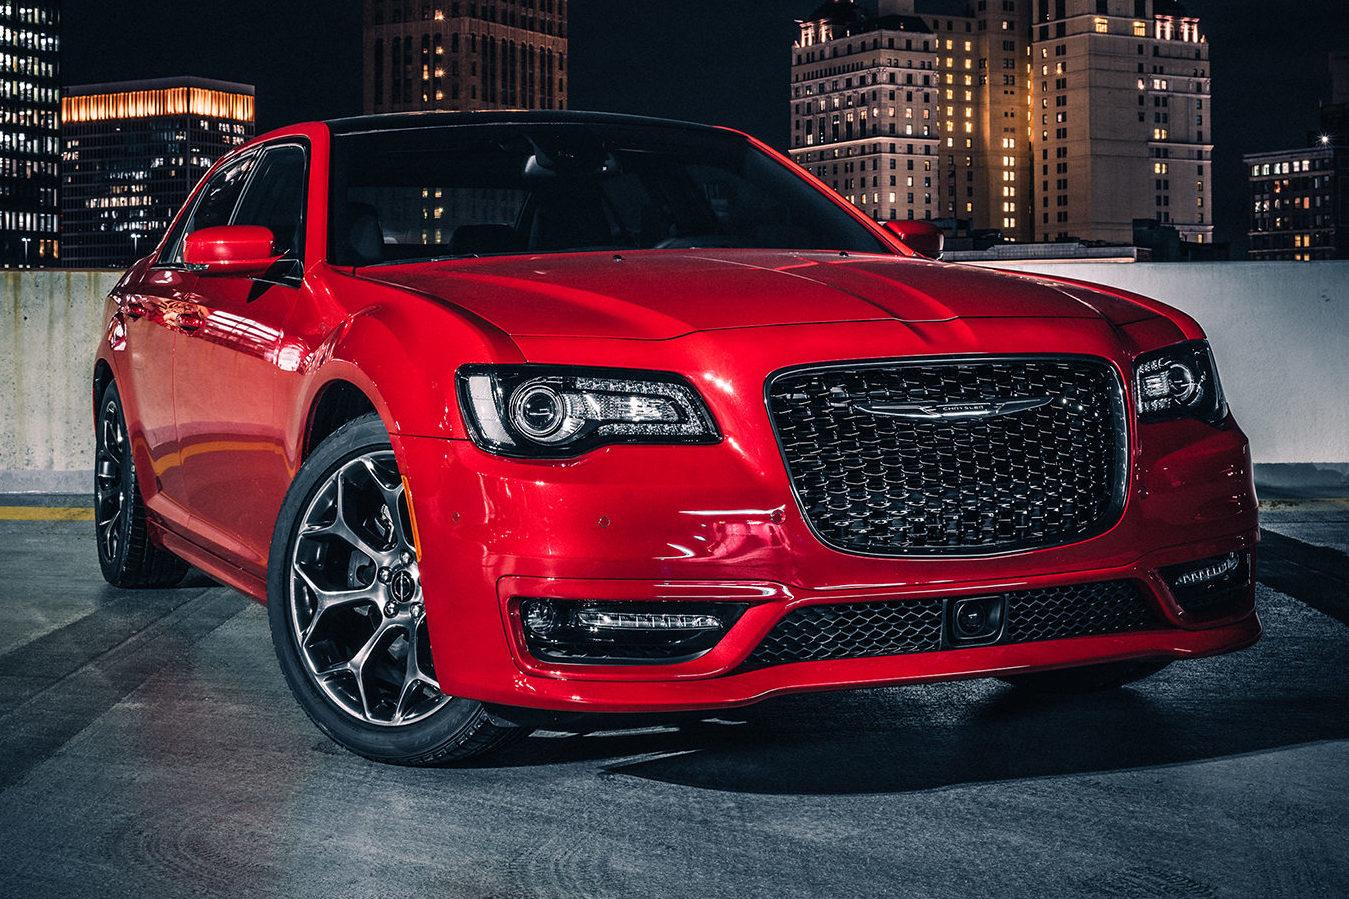 2018 Chrysler 300S front view 01 e1504194198506 کرایسلر ۳۰۰ مدل ۲۰۱۸ نقد و بررسی   اجاره ماشین